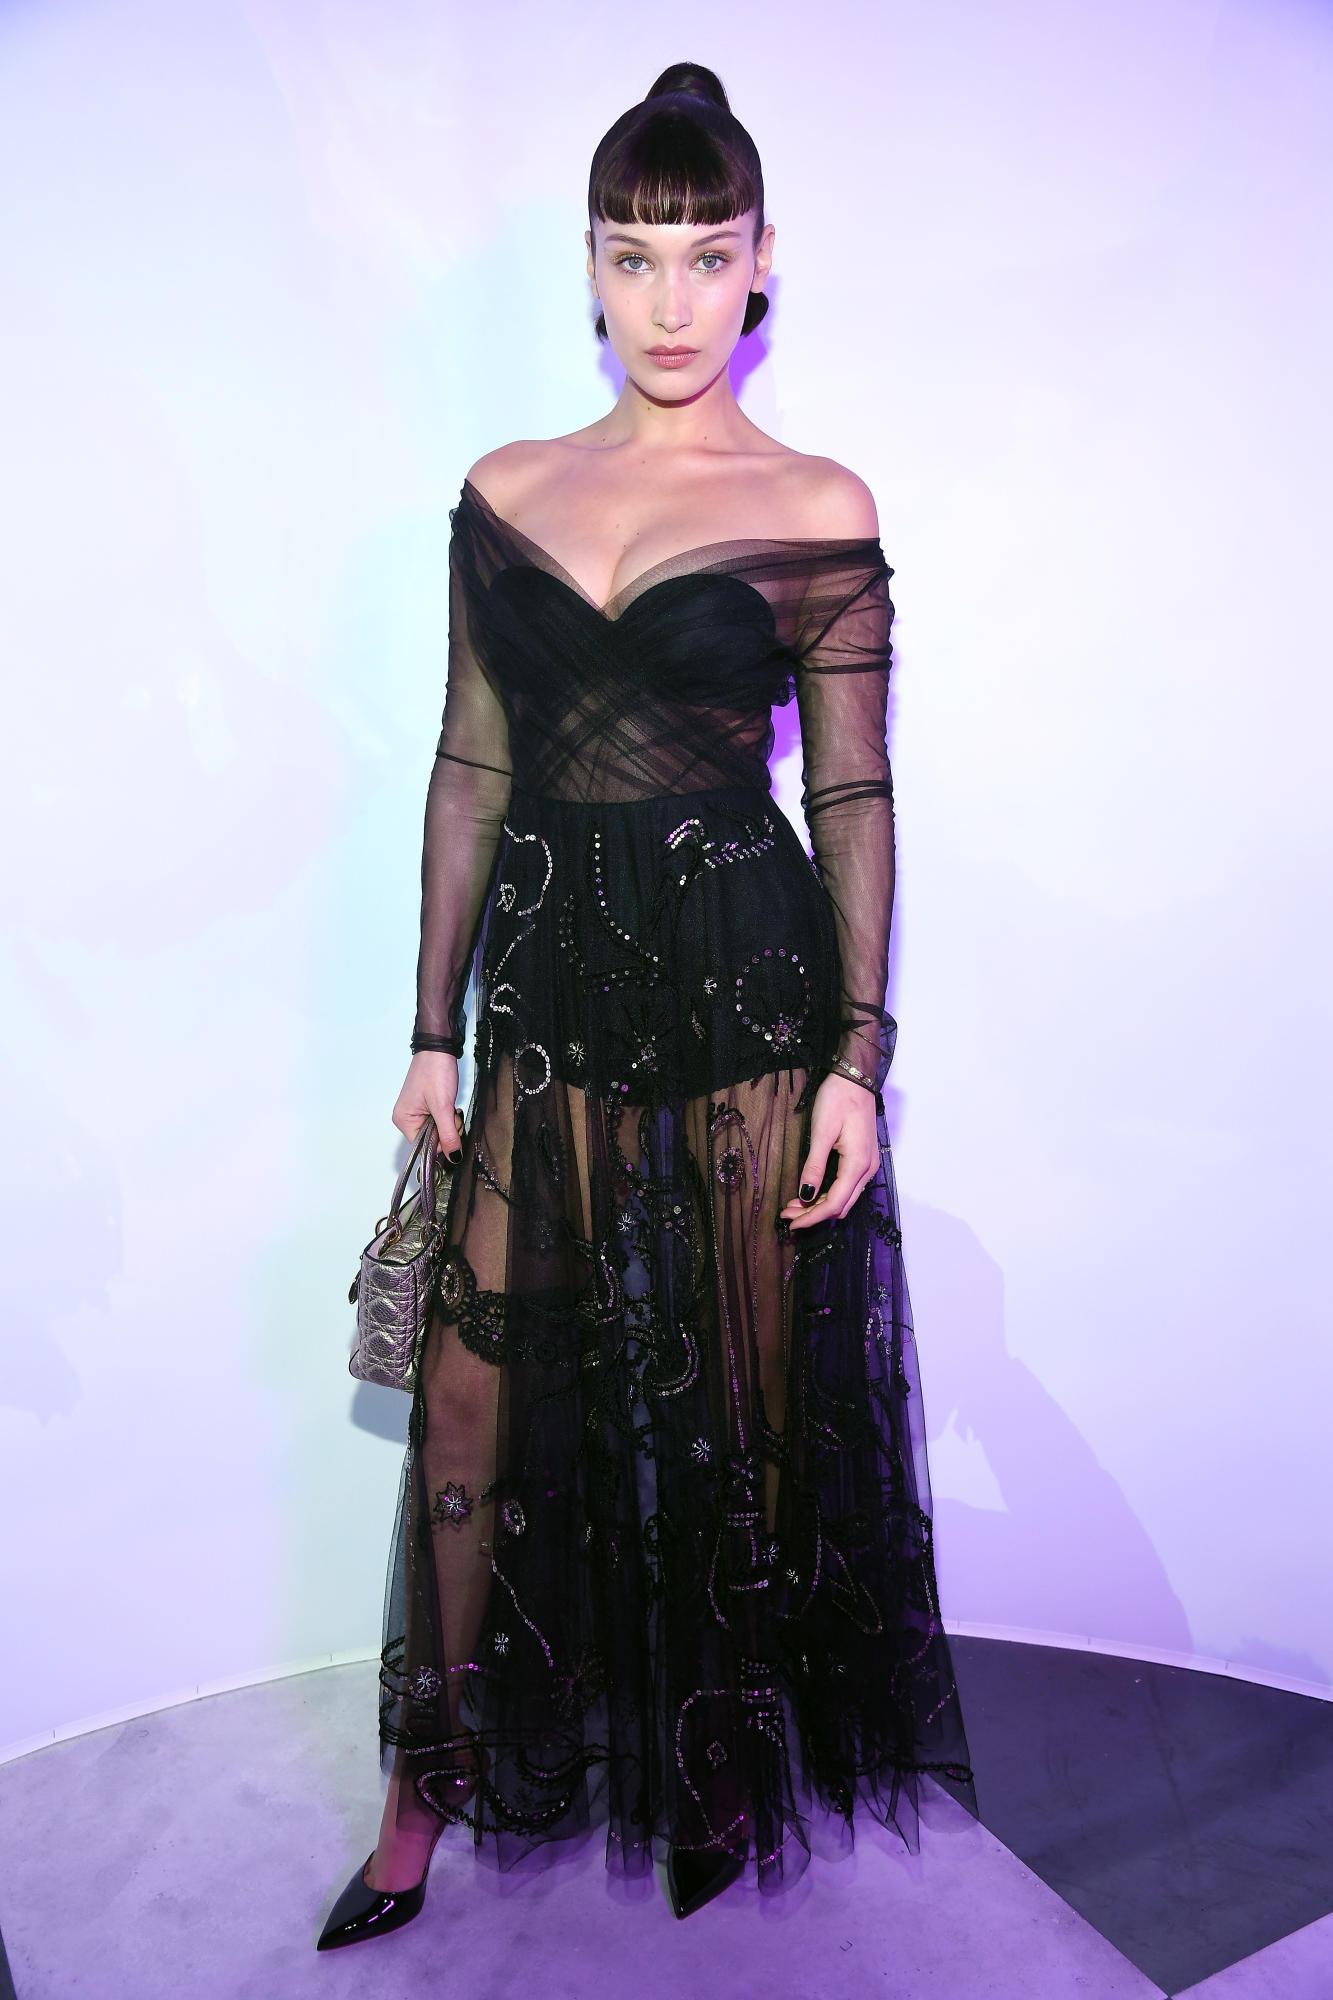 15 ngôi sao mặc đẹp nhất tại Tuần lễ Haute Couture Paris 2018